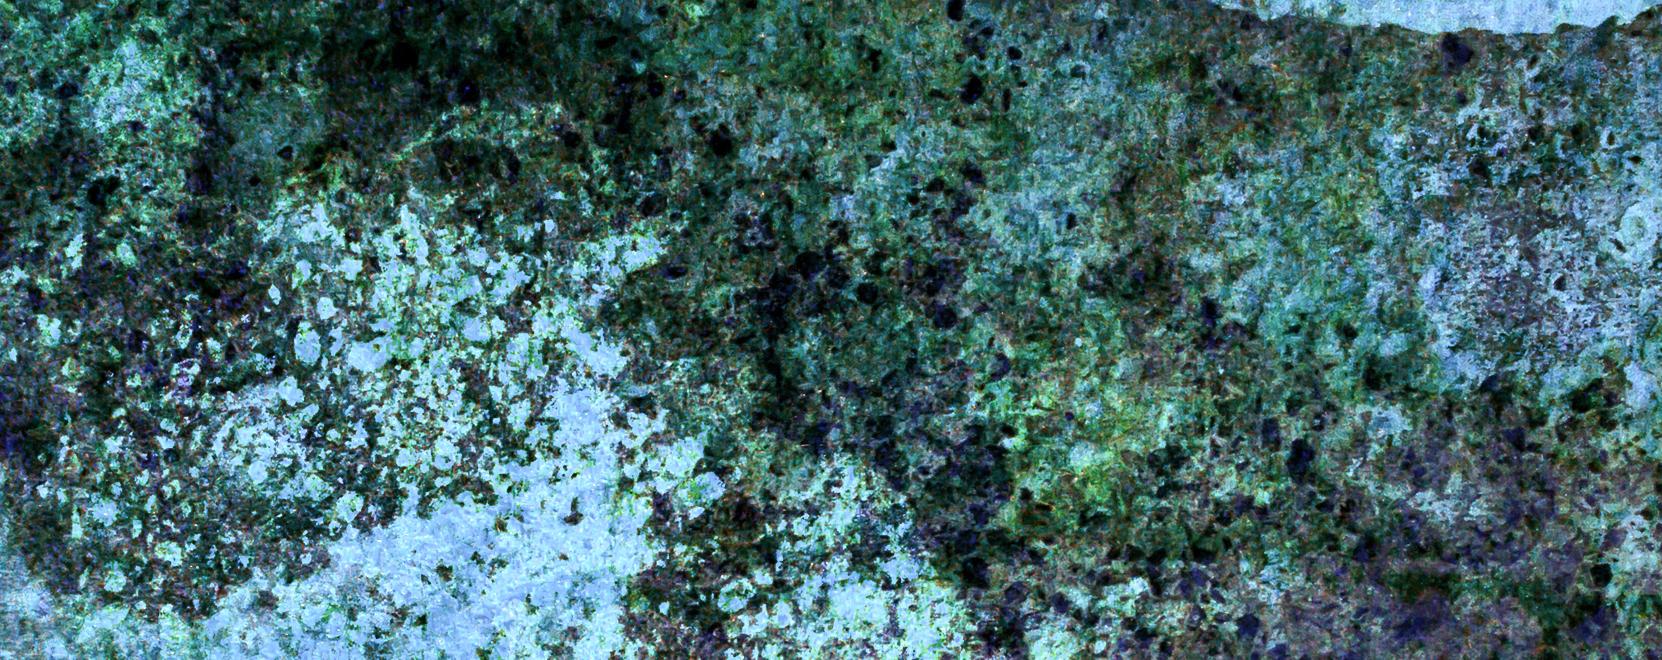 Grunge Texture Blue Green Wall Rough Dirty Urban Photoshop